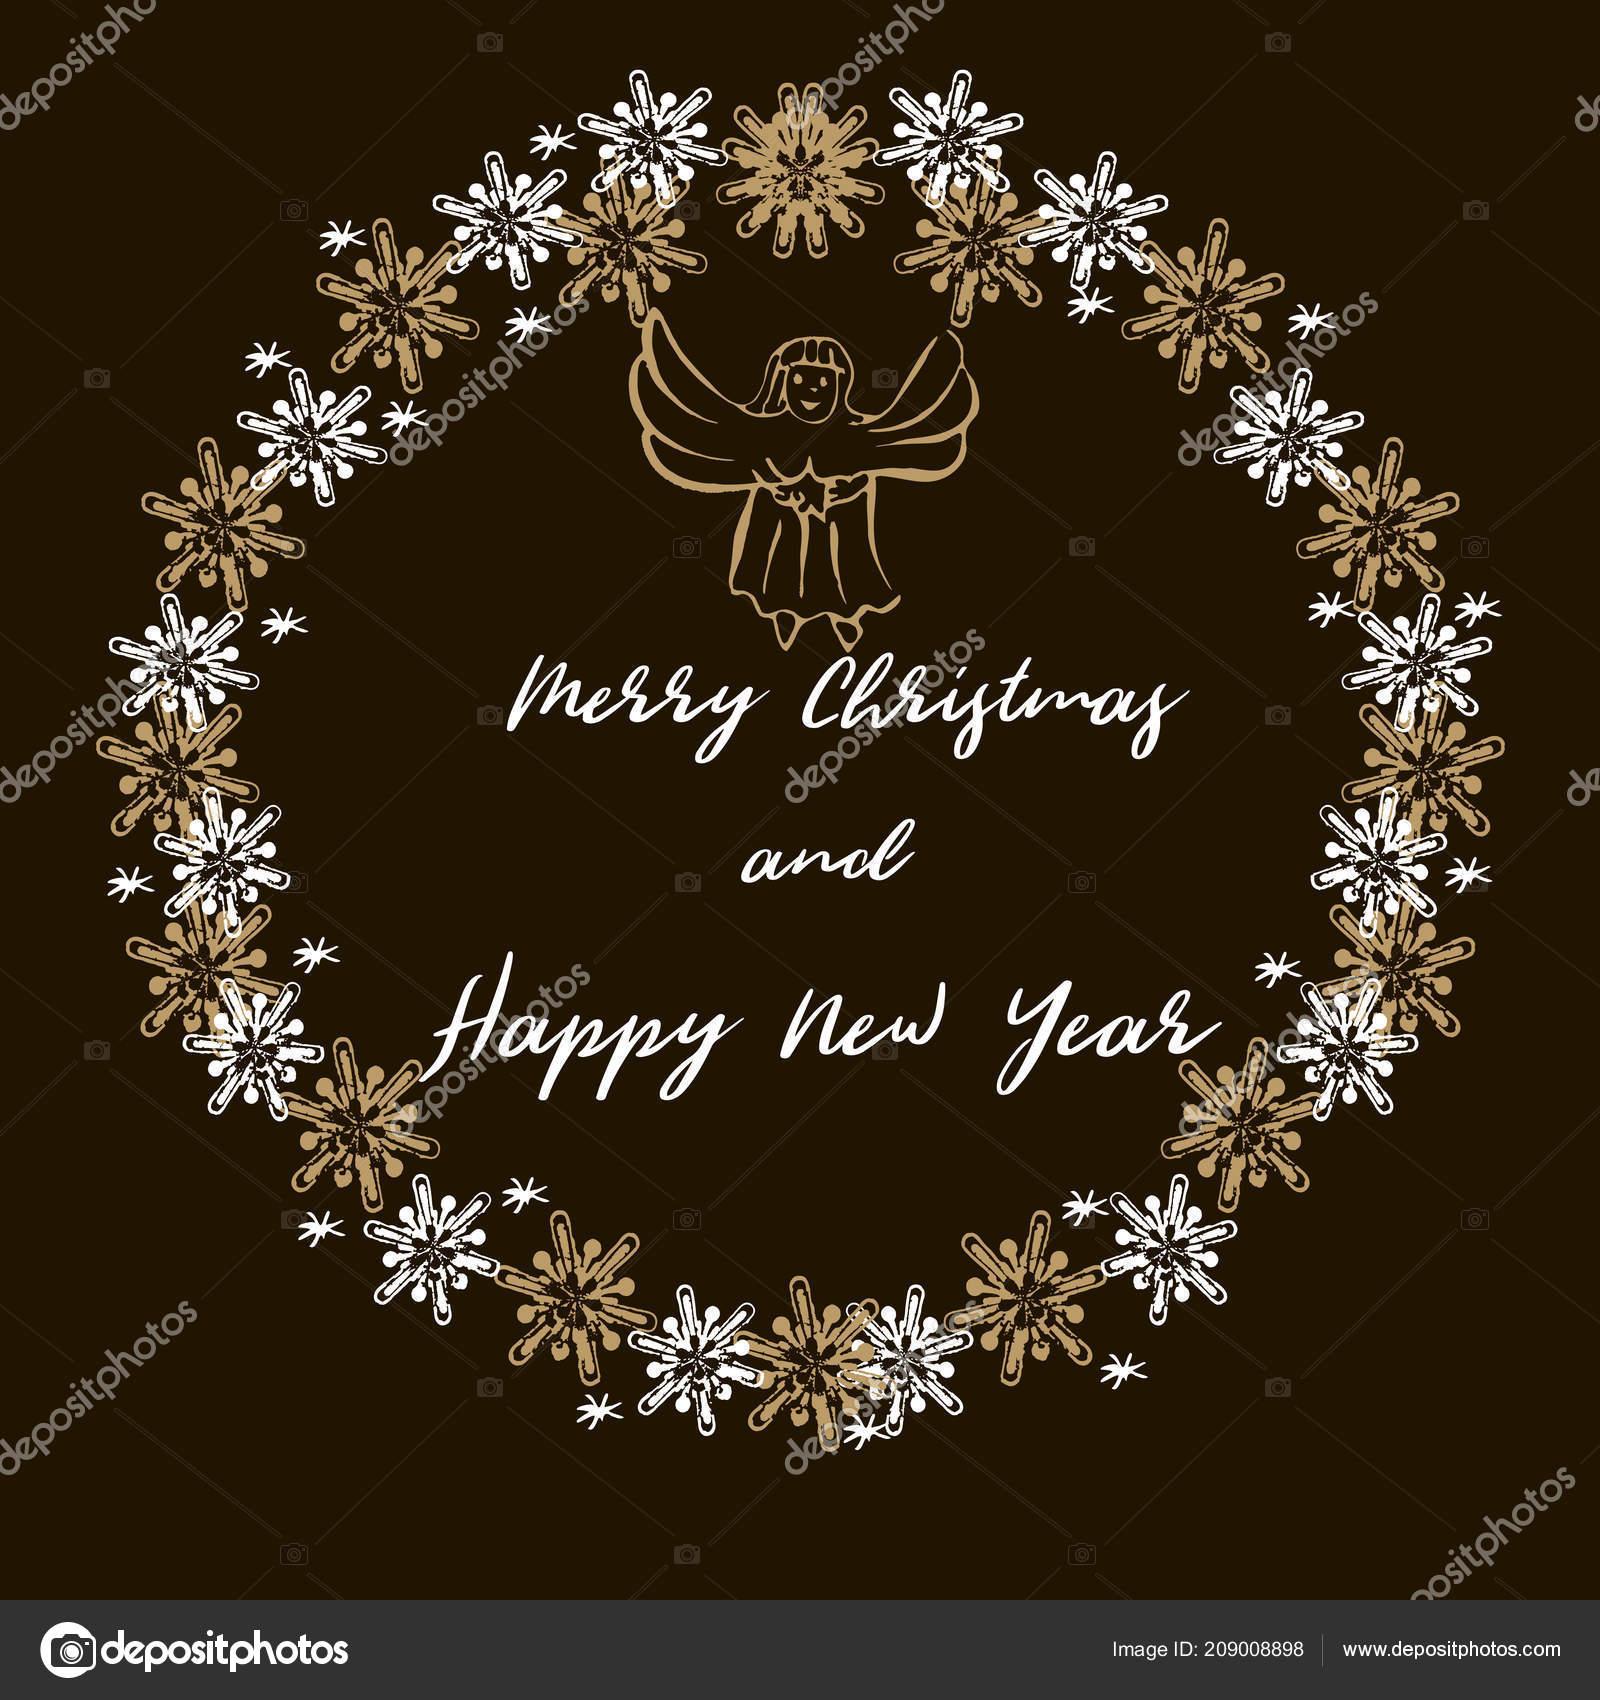 Merry Christmas Happy New Year Greeting Card Christmas Wreath Deers